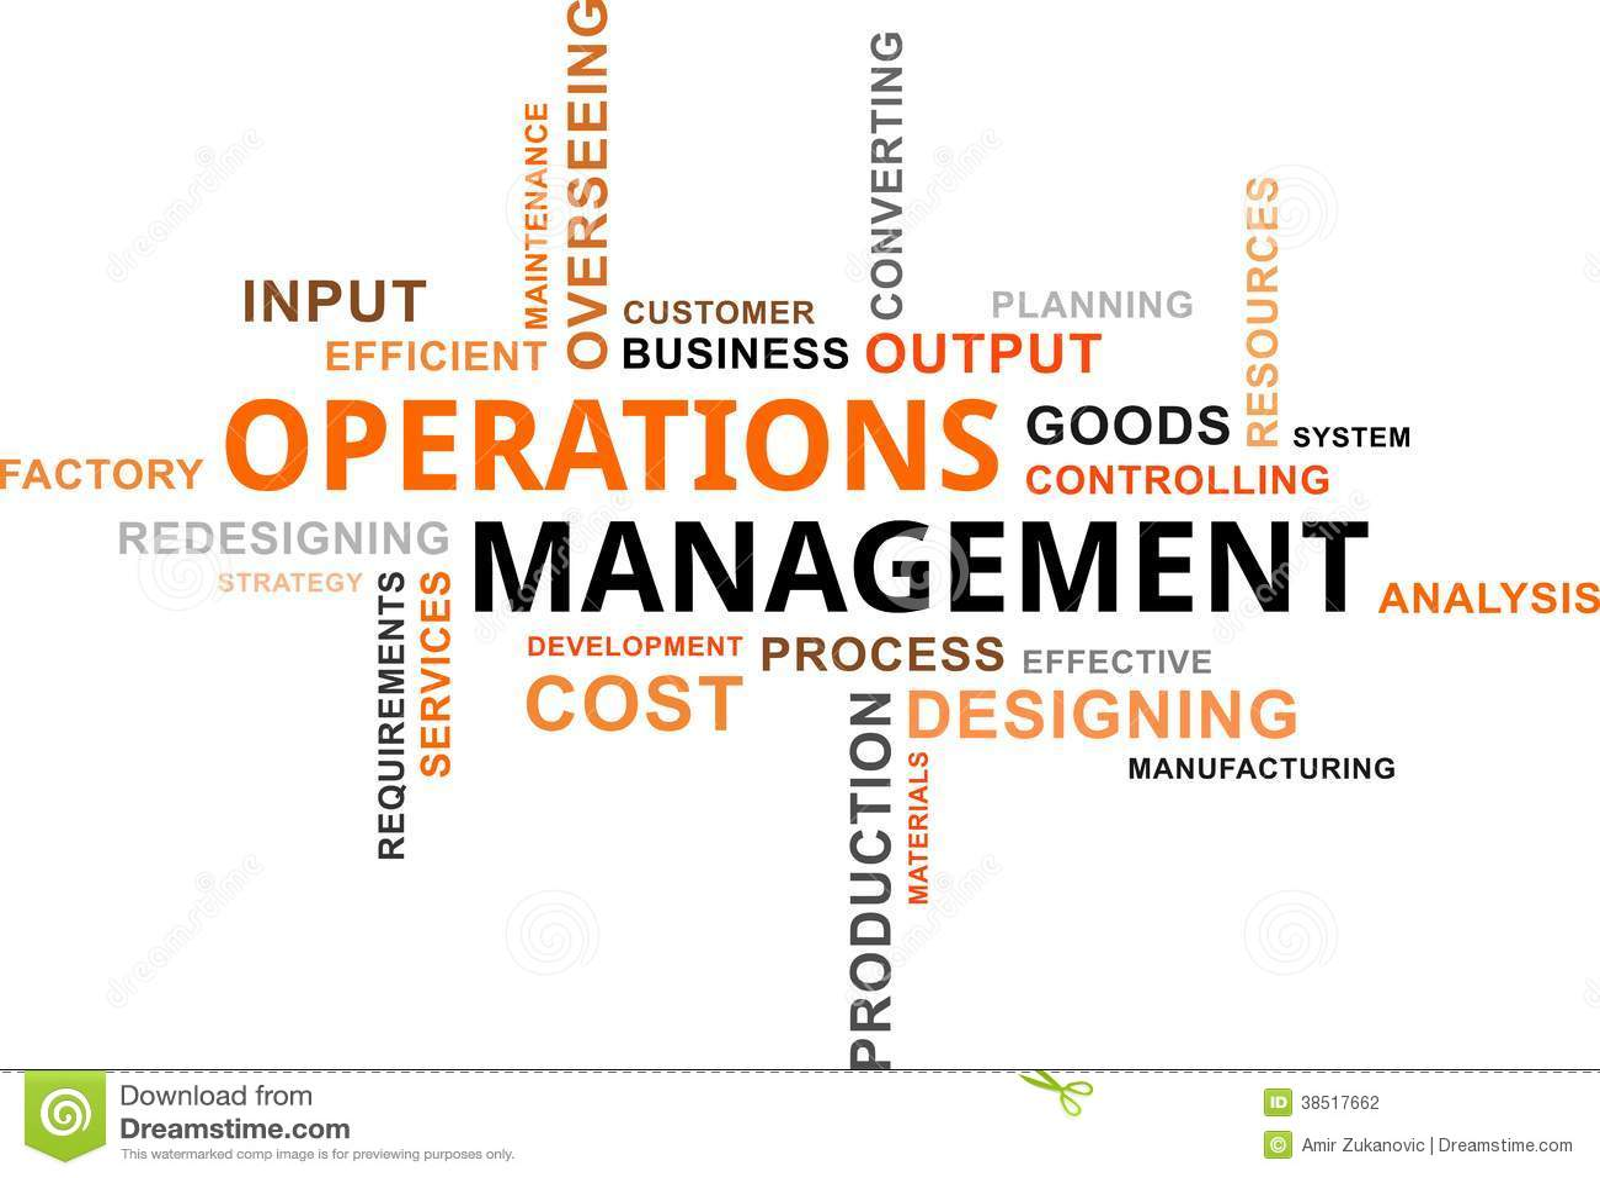 Operations Management ontime com